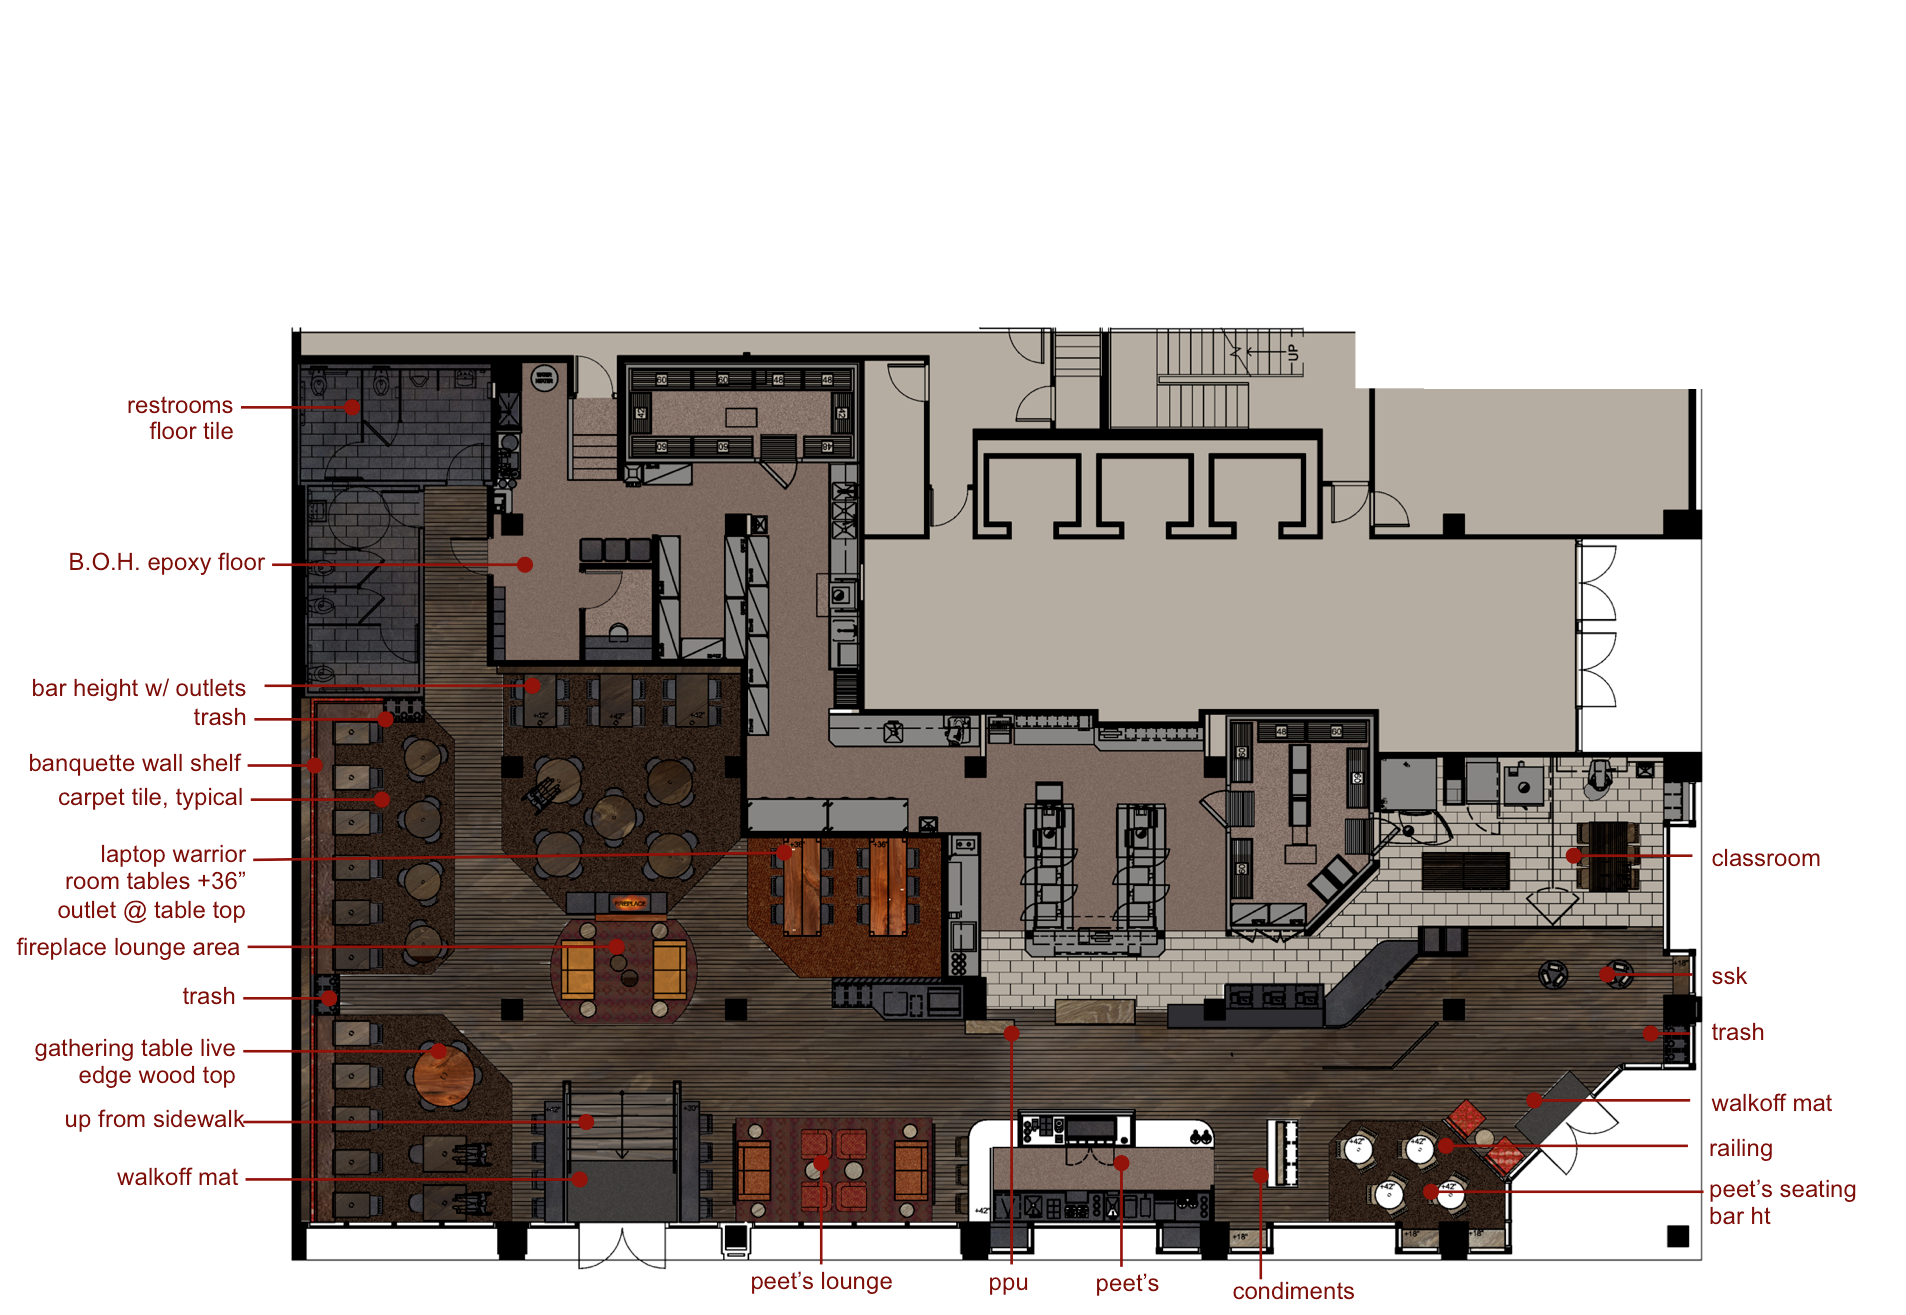 Specialty's Cafe & Bakery - conceptual floor plan